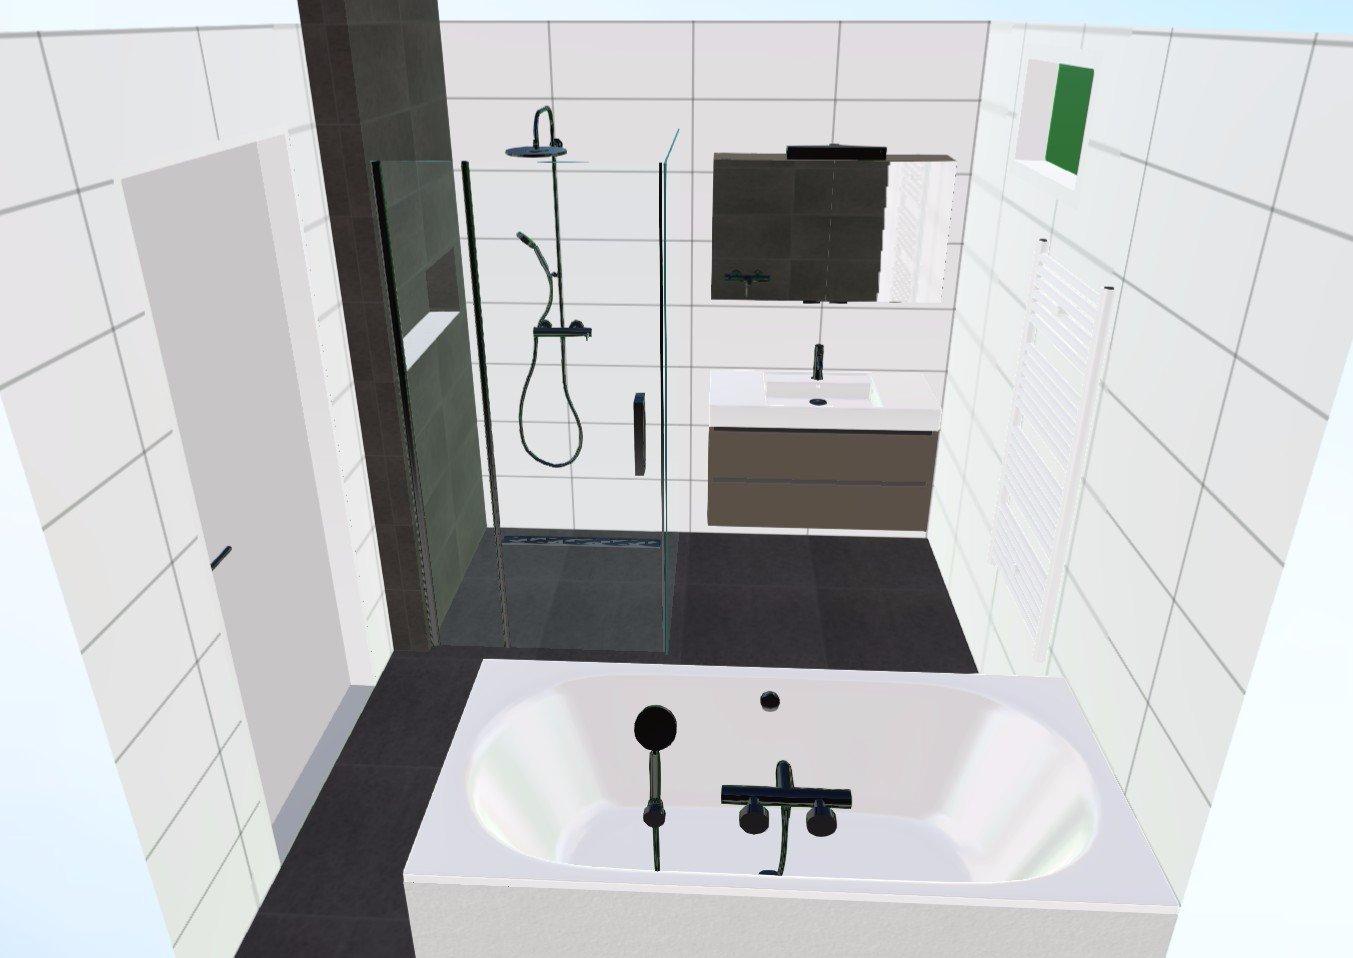 Leiding omleggen in keuken badkamer en verwarmingsbuizen infrezen ...